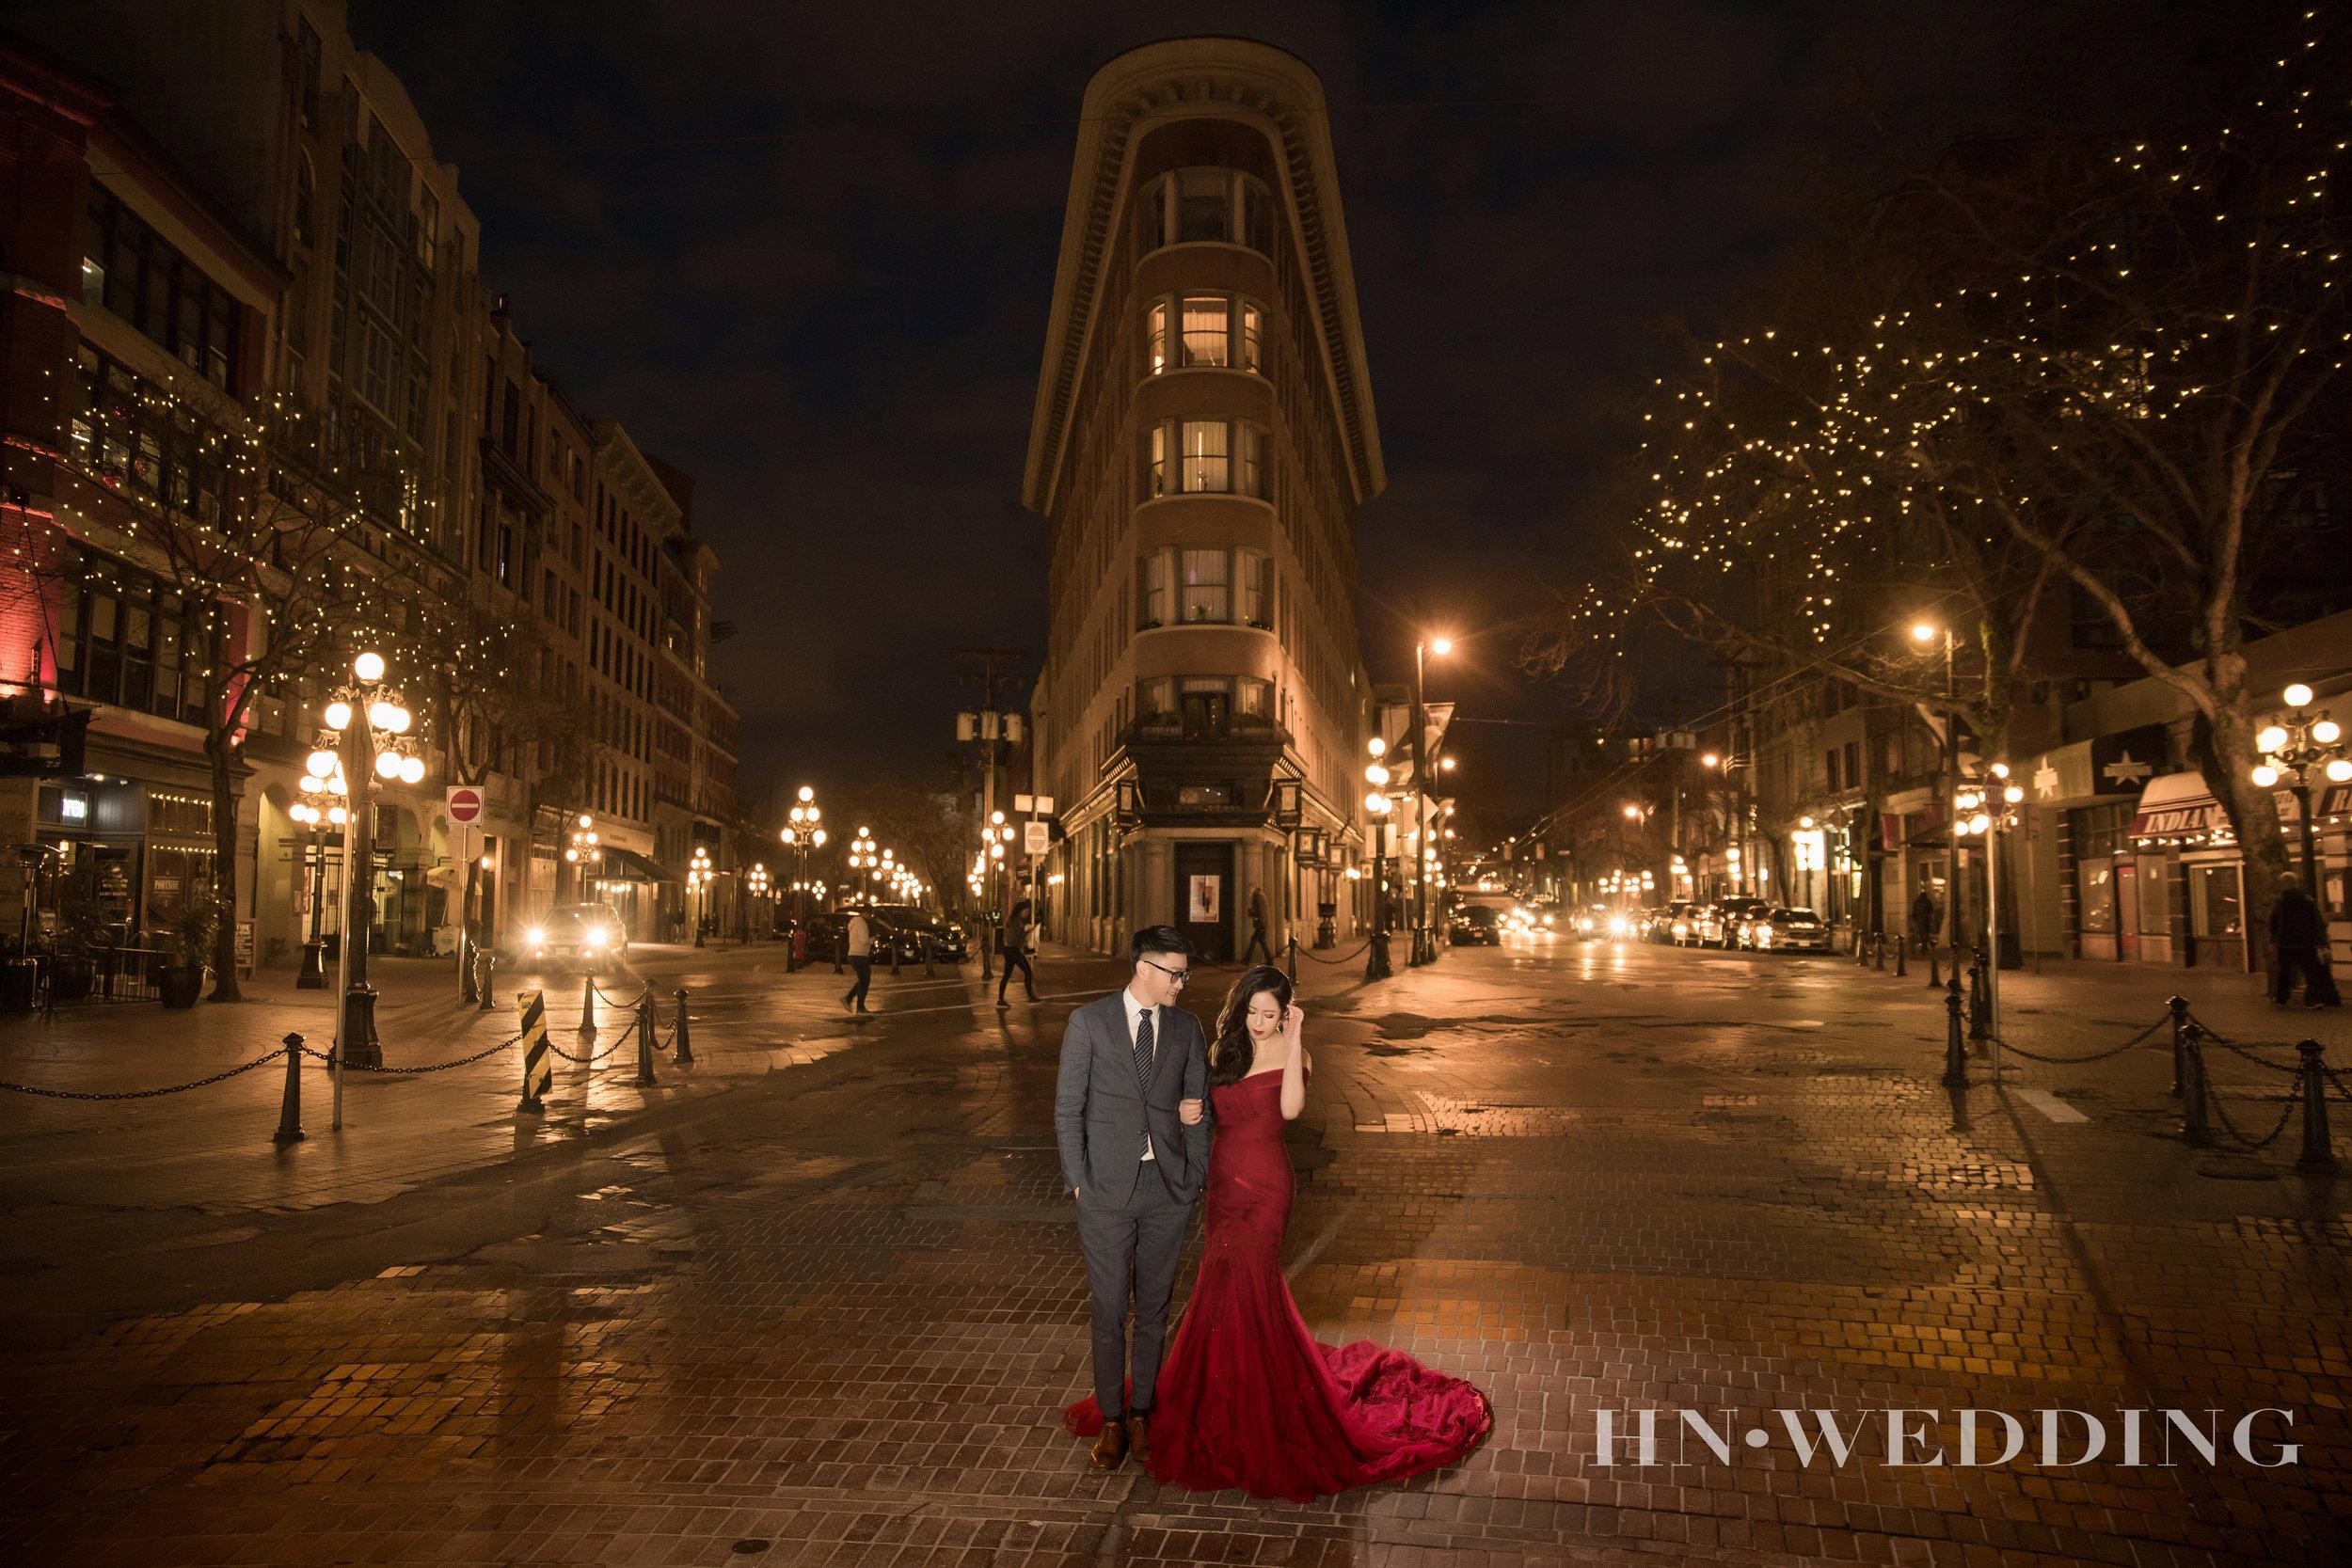 hnwedding20180519wedding-12.jpg